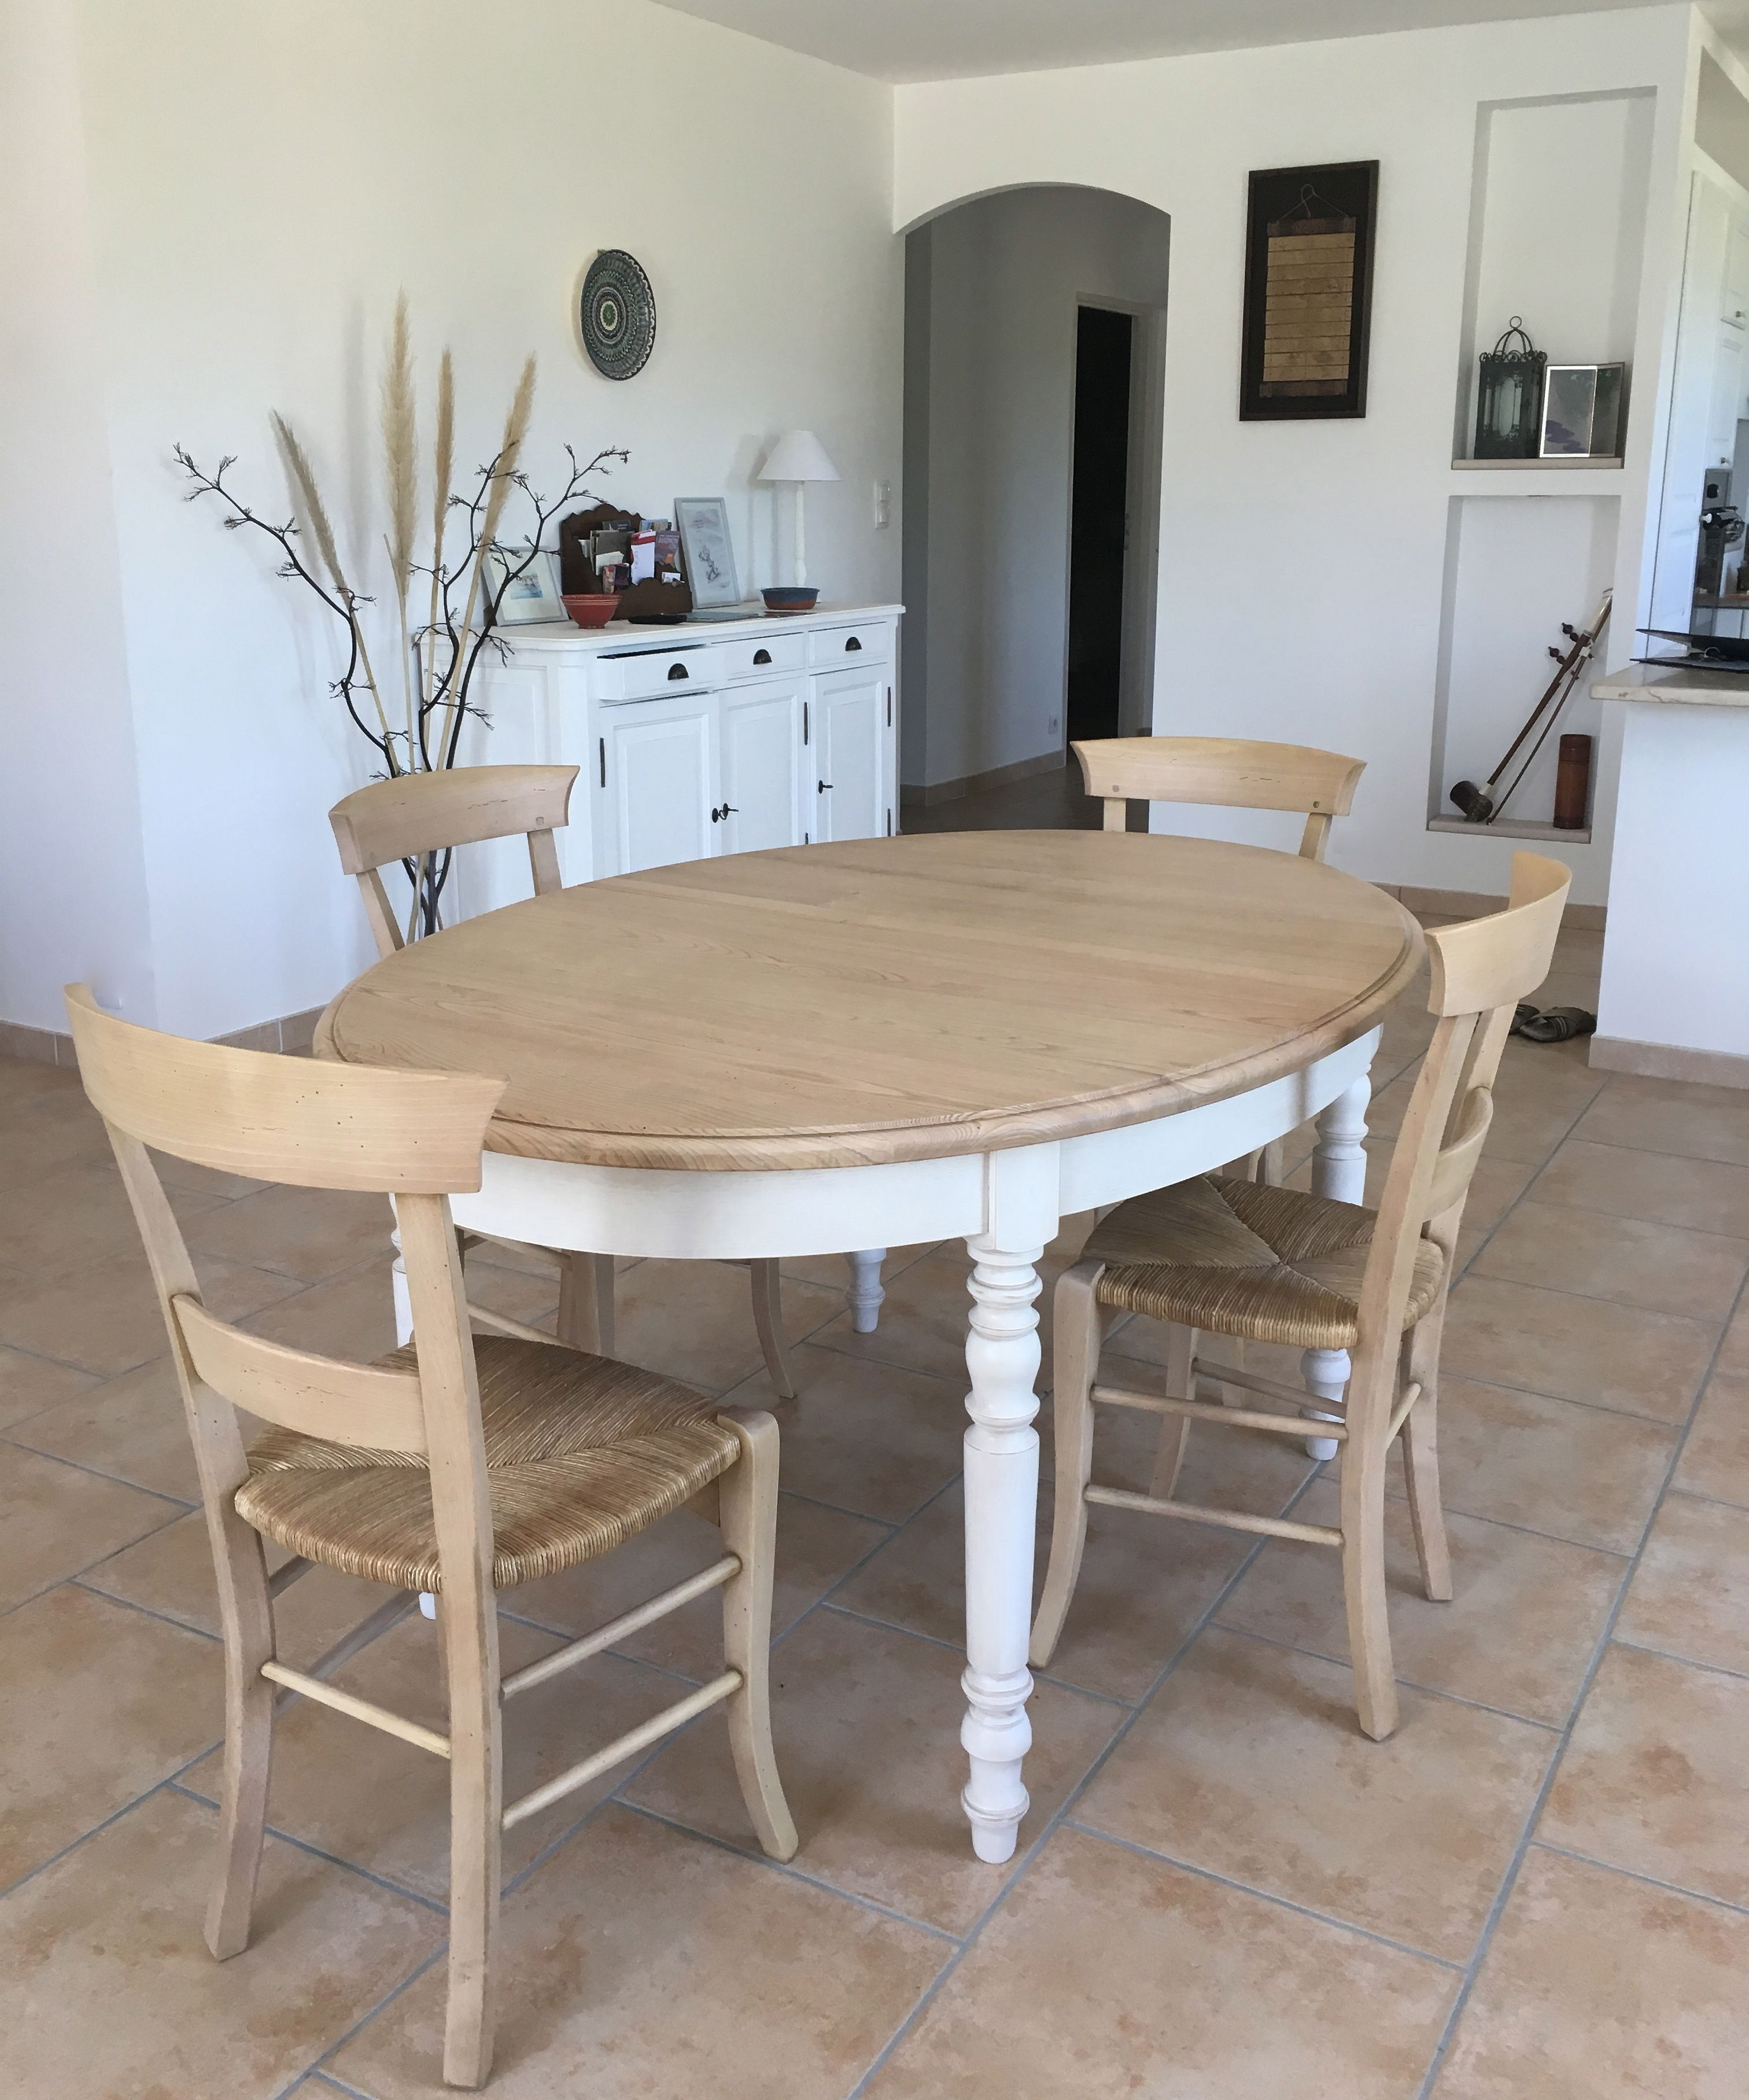 table salle manger ovale bois naturel massif et blanc ambiance campagne chic par coup - Table A Manger Ovale